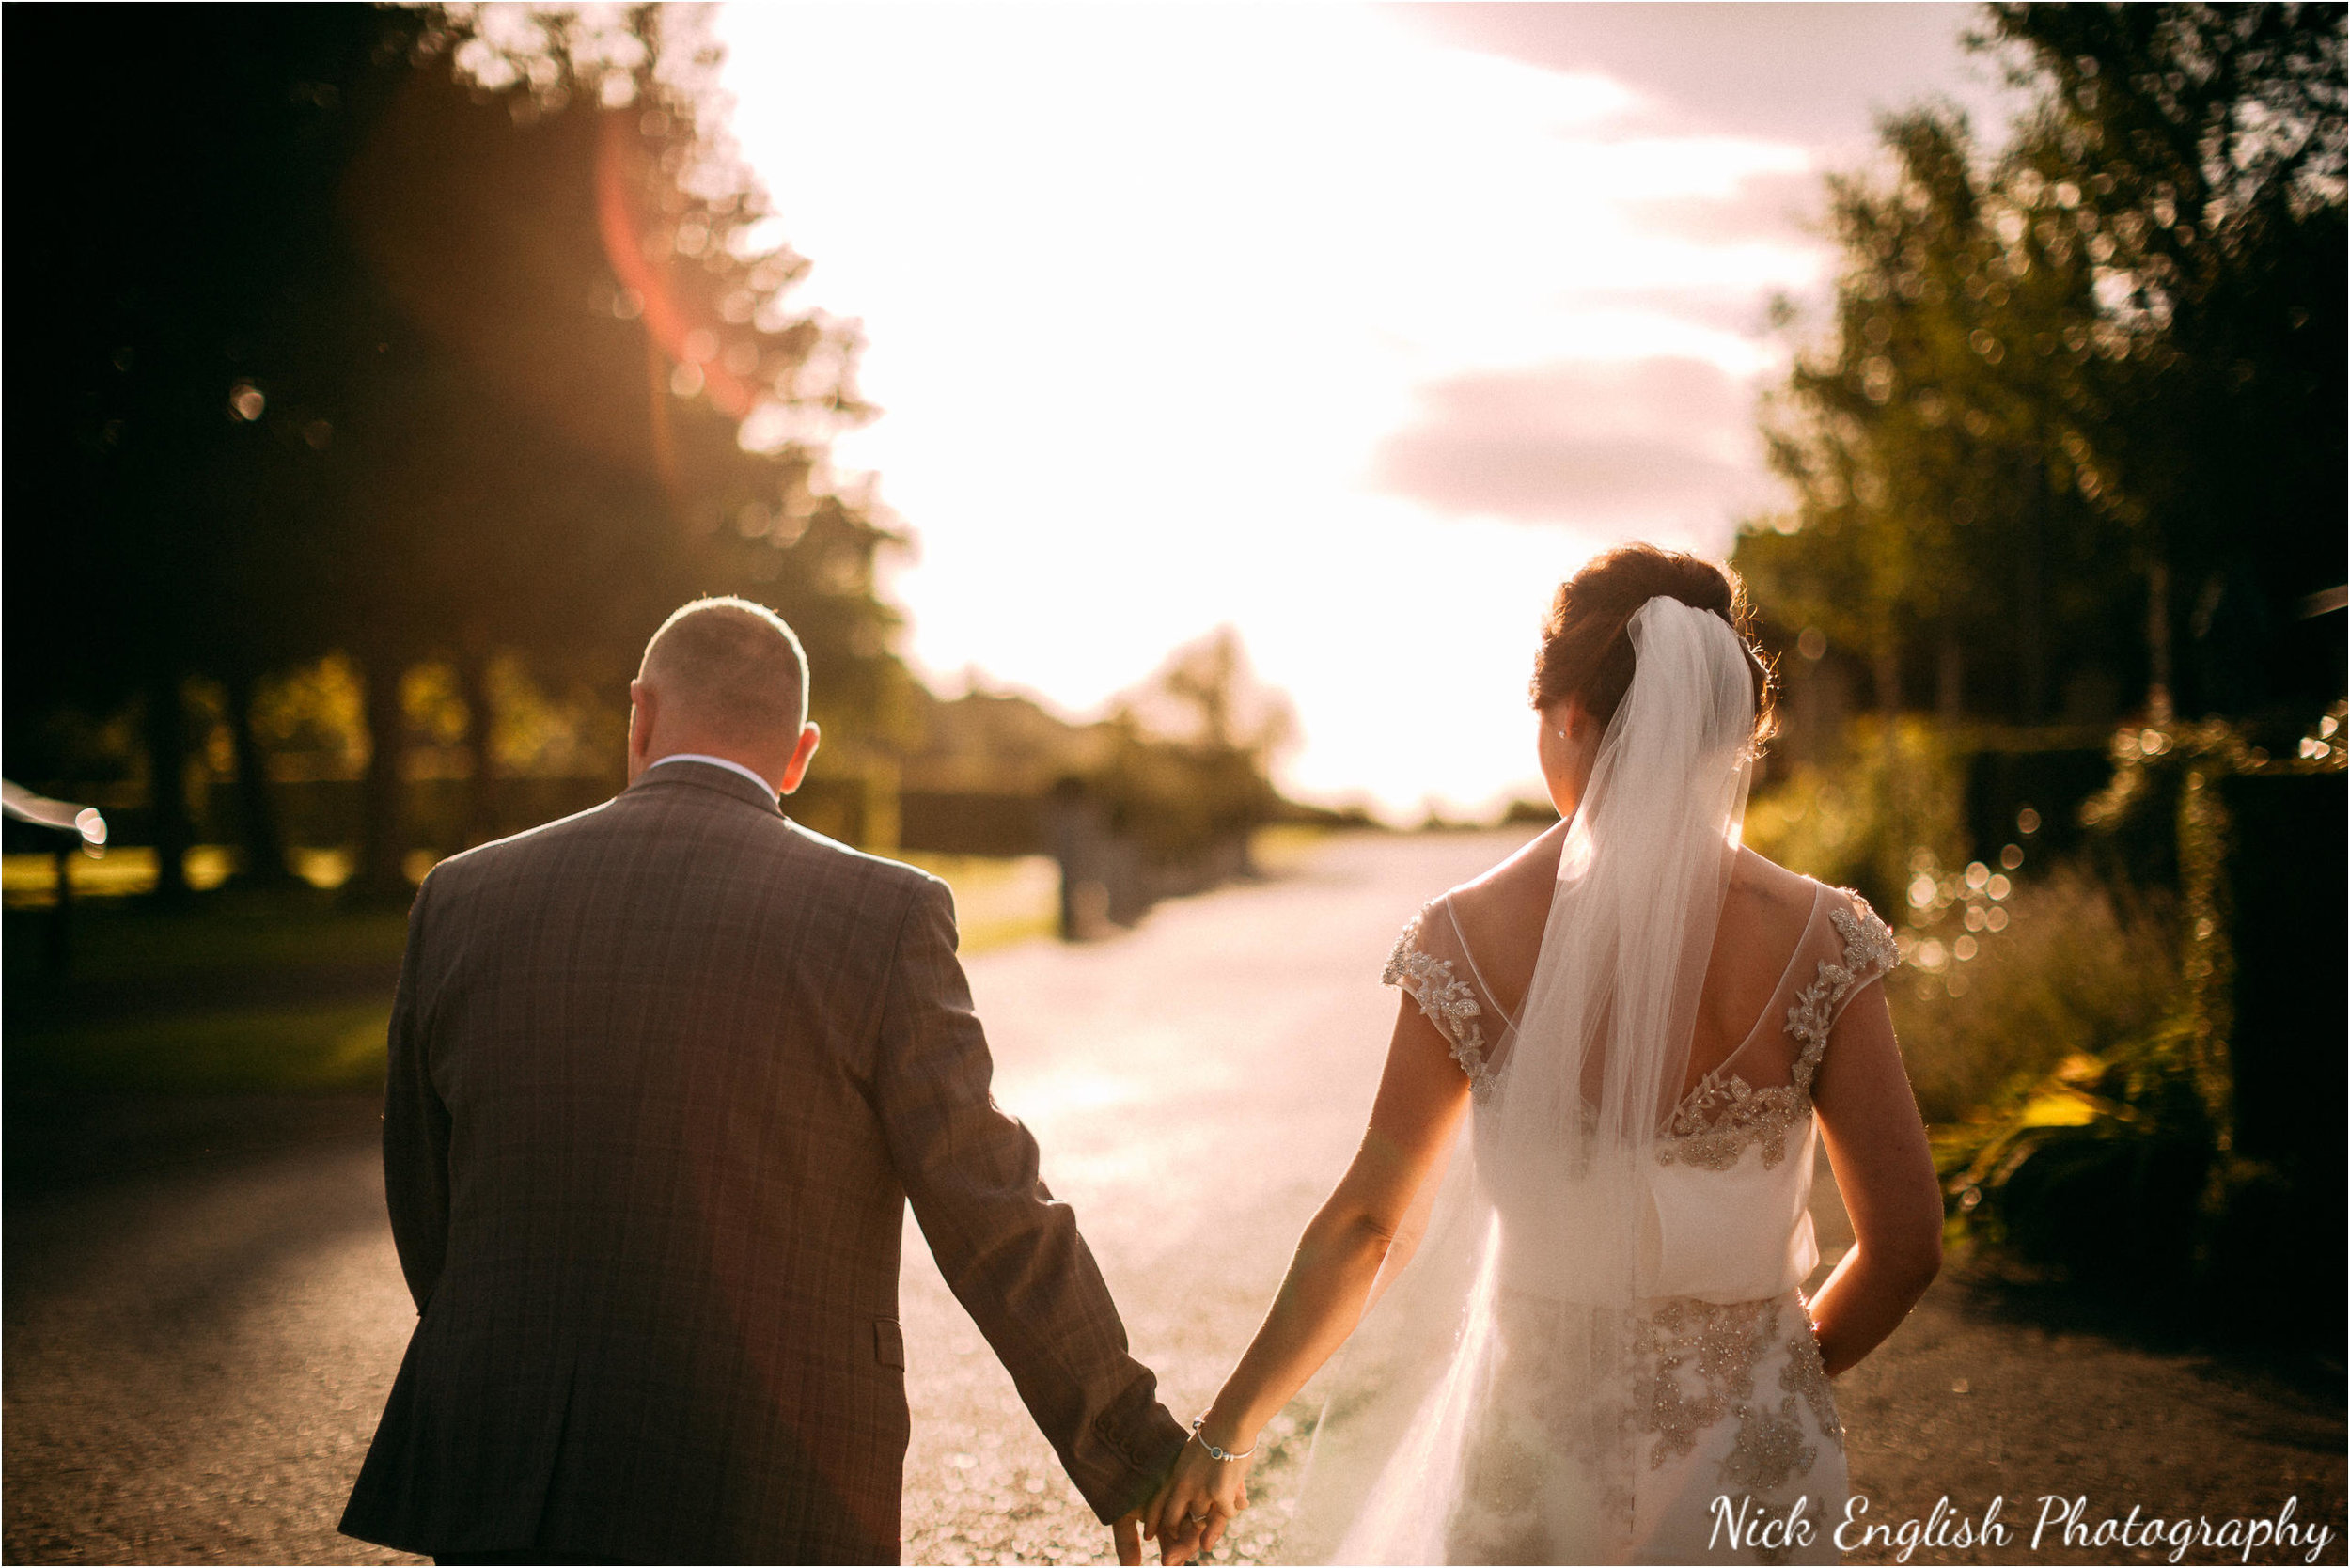 Stacey-Ash-Wedding-Photographs-Stanley-House-Preston-Lancashire-215.jpg